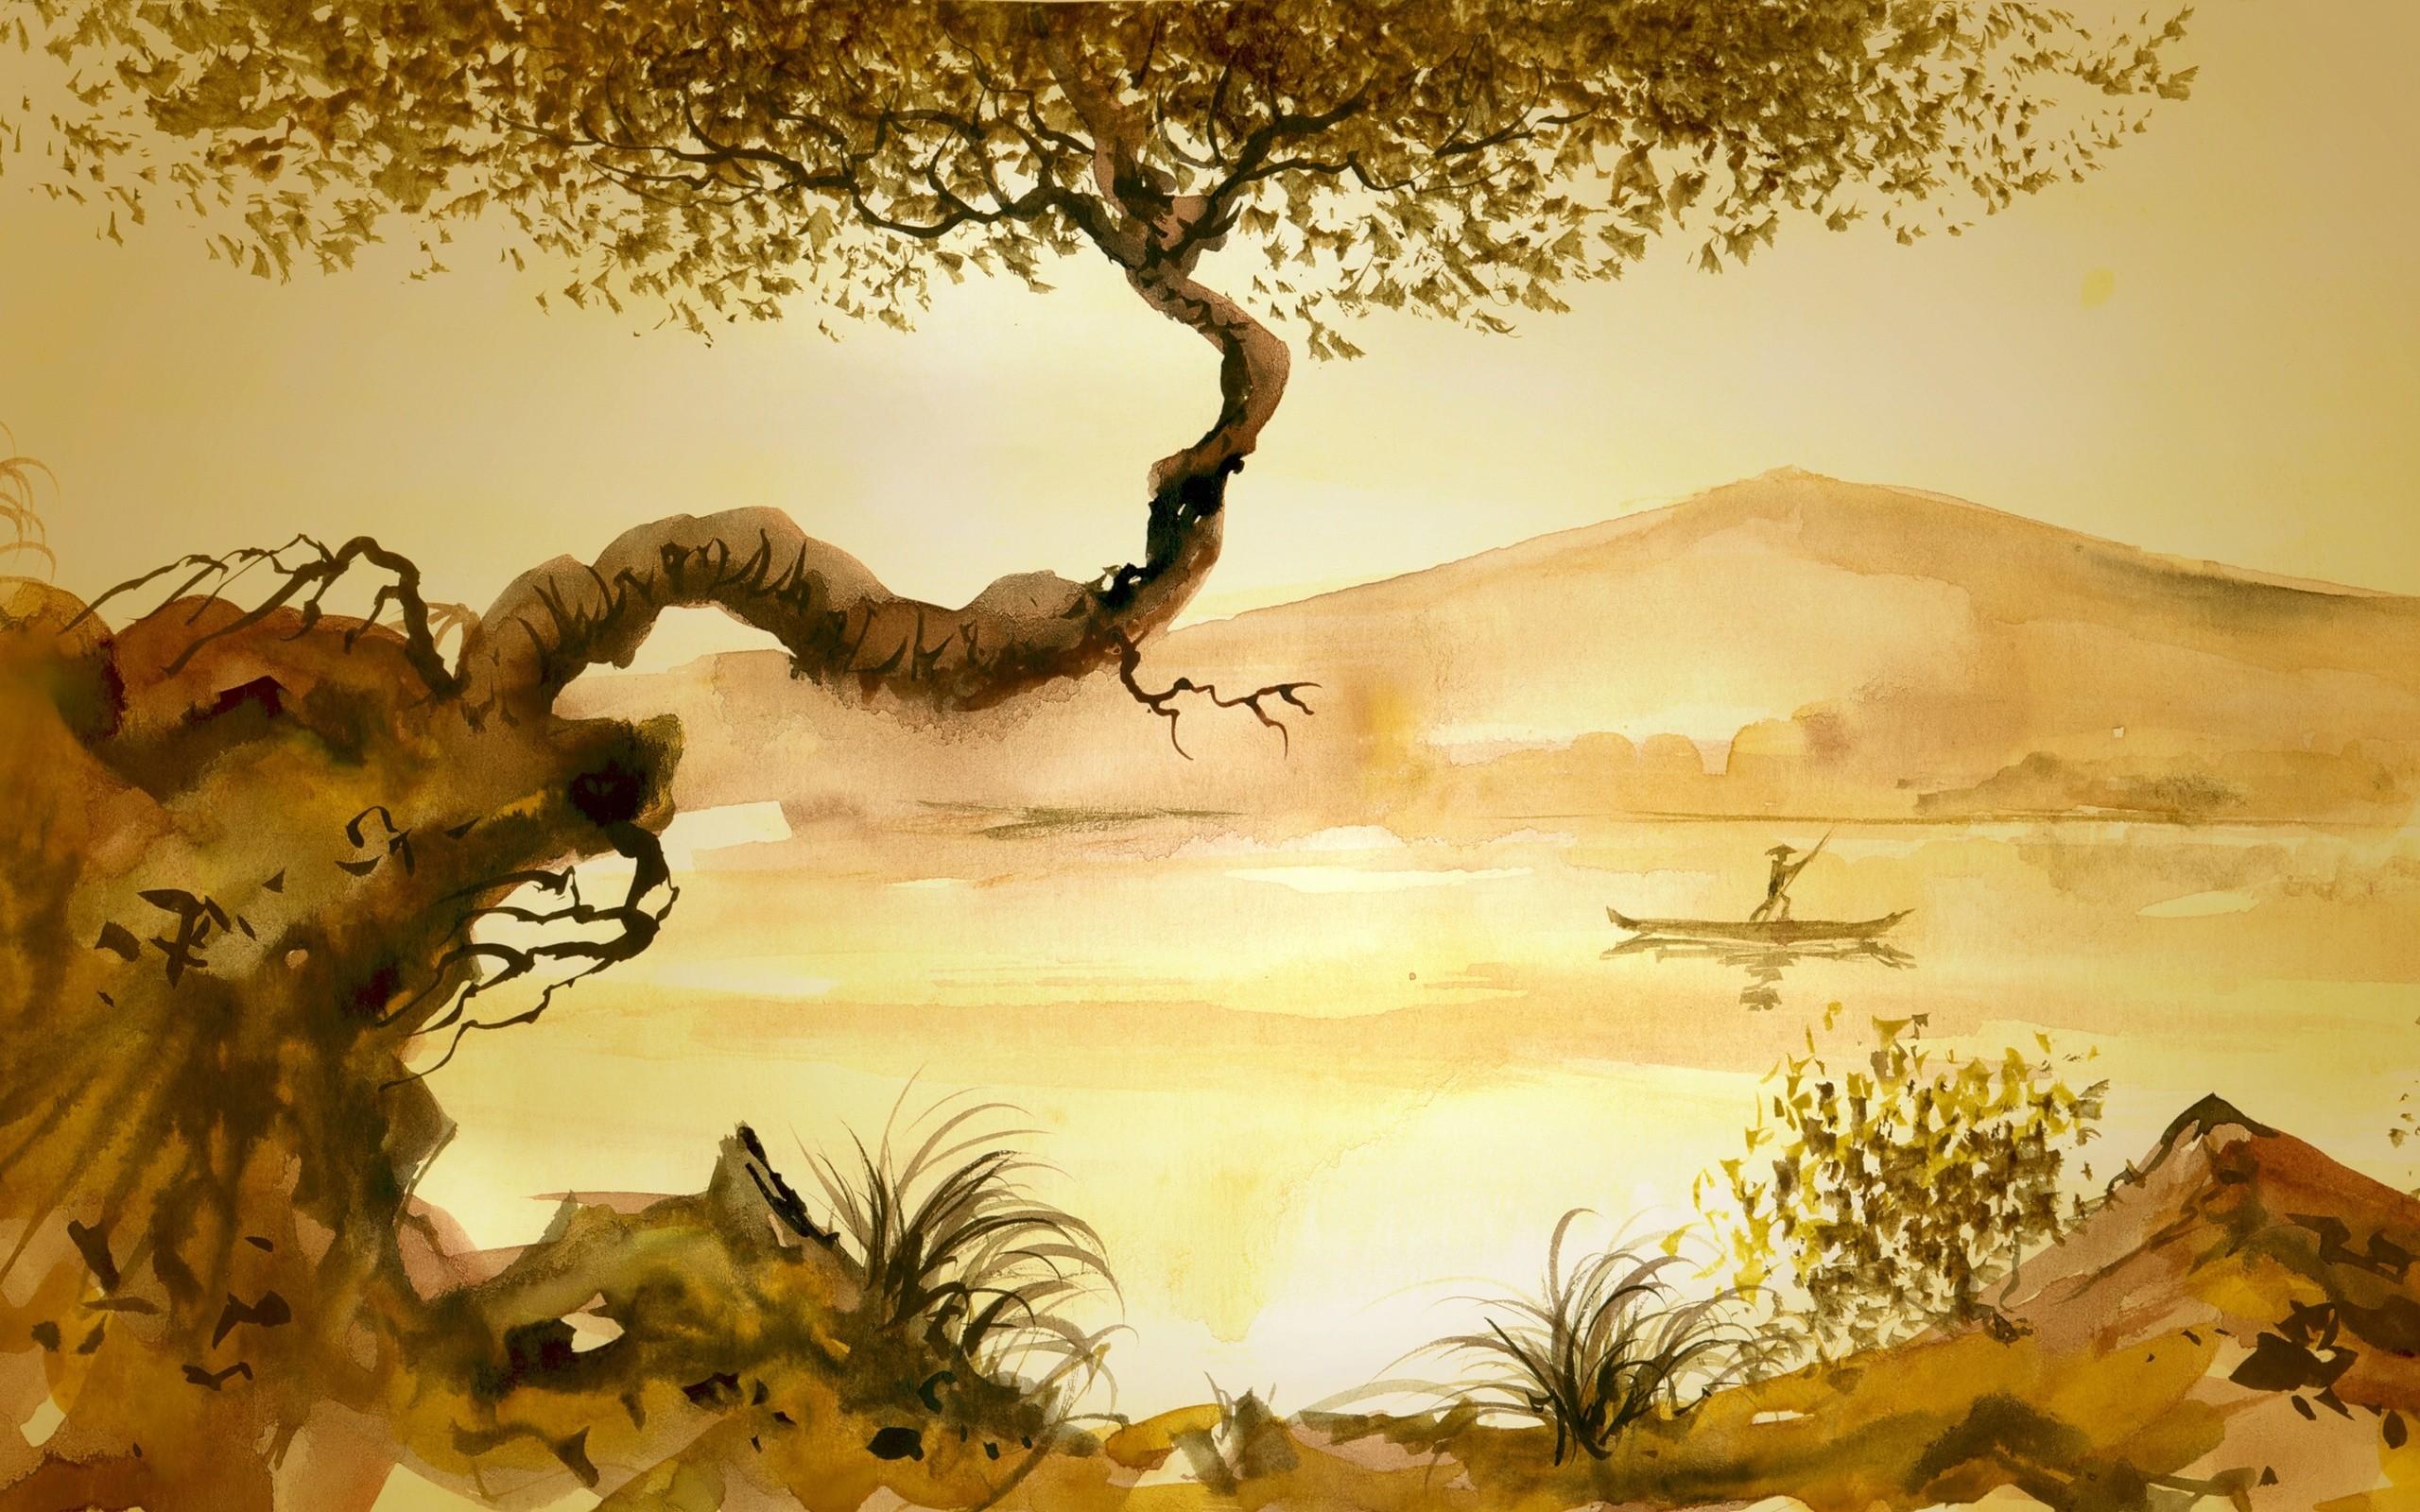 Res: 2560x1600, Junk Man Tree Grass Asian Lake Painting Mood Wallpaper